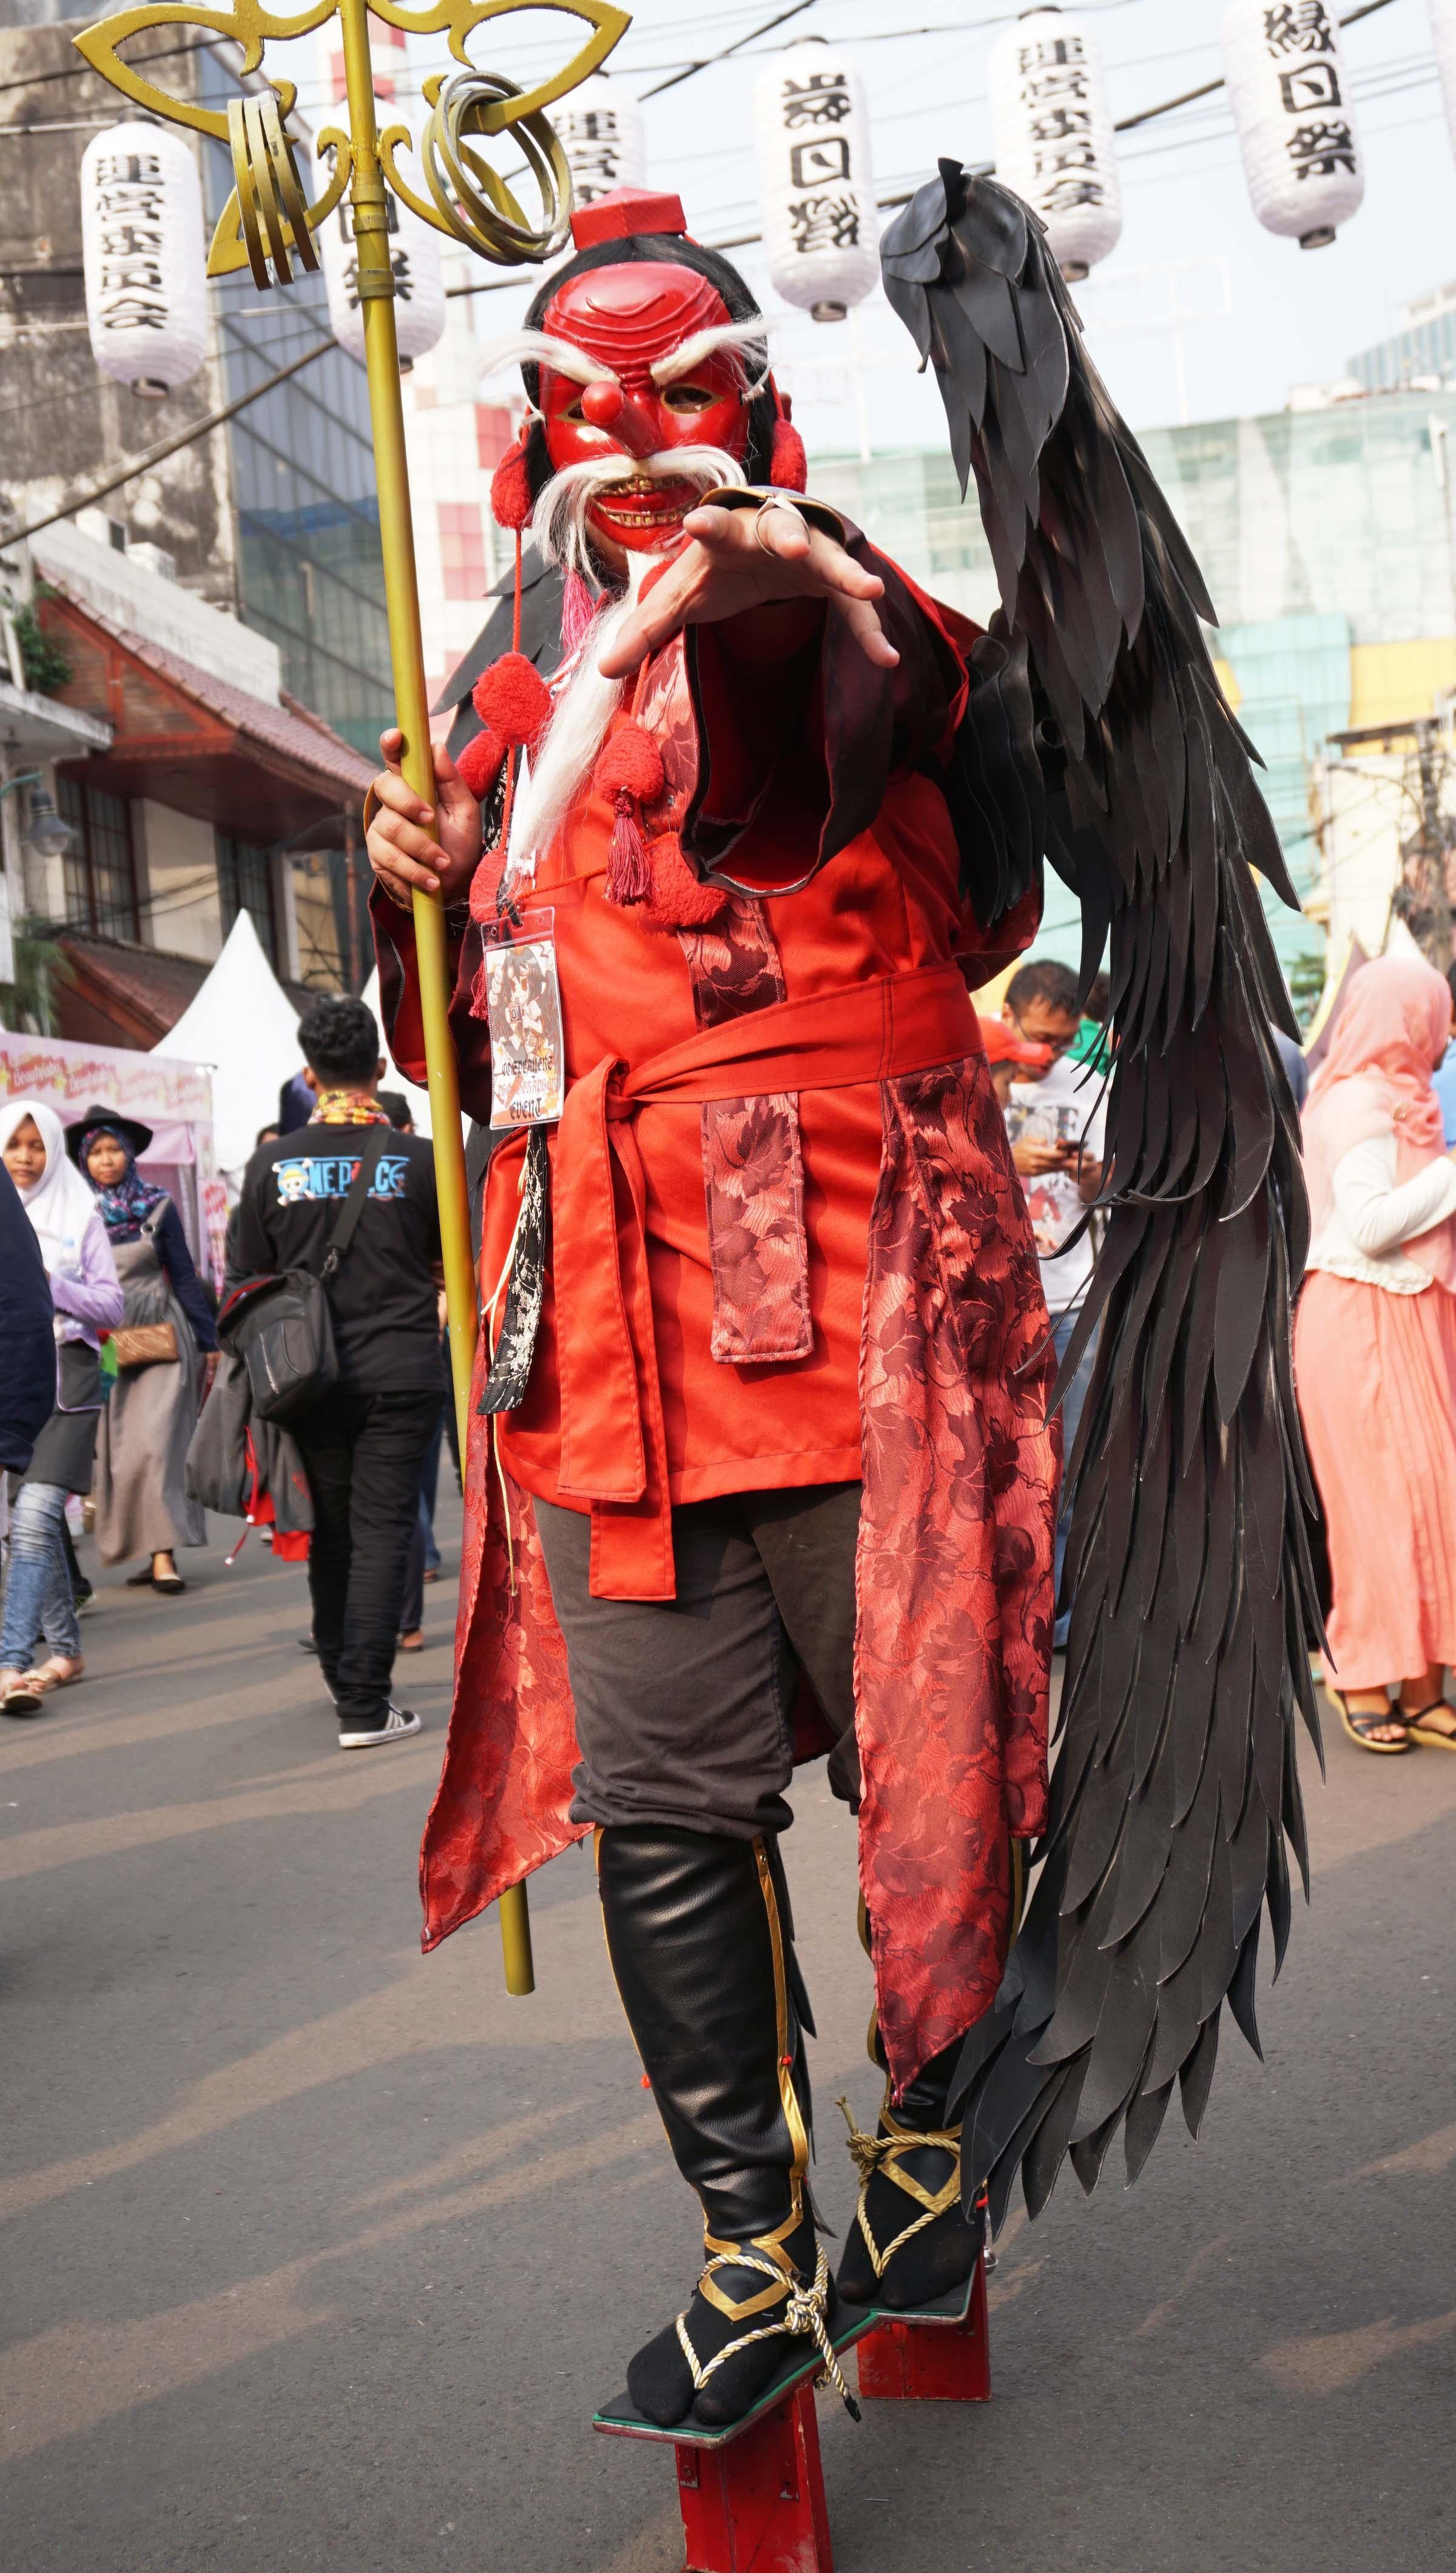 Gambar Merah Karnaval Pakaian Jepang Performance Art Cosplay